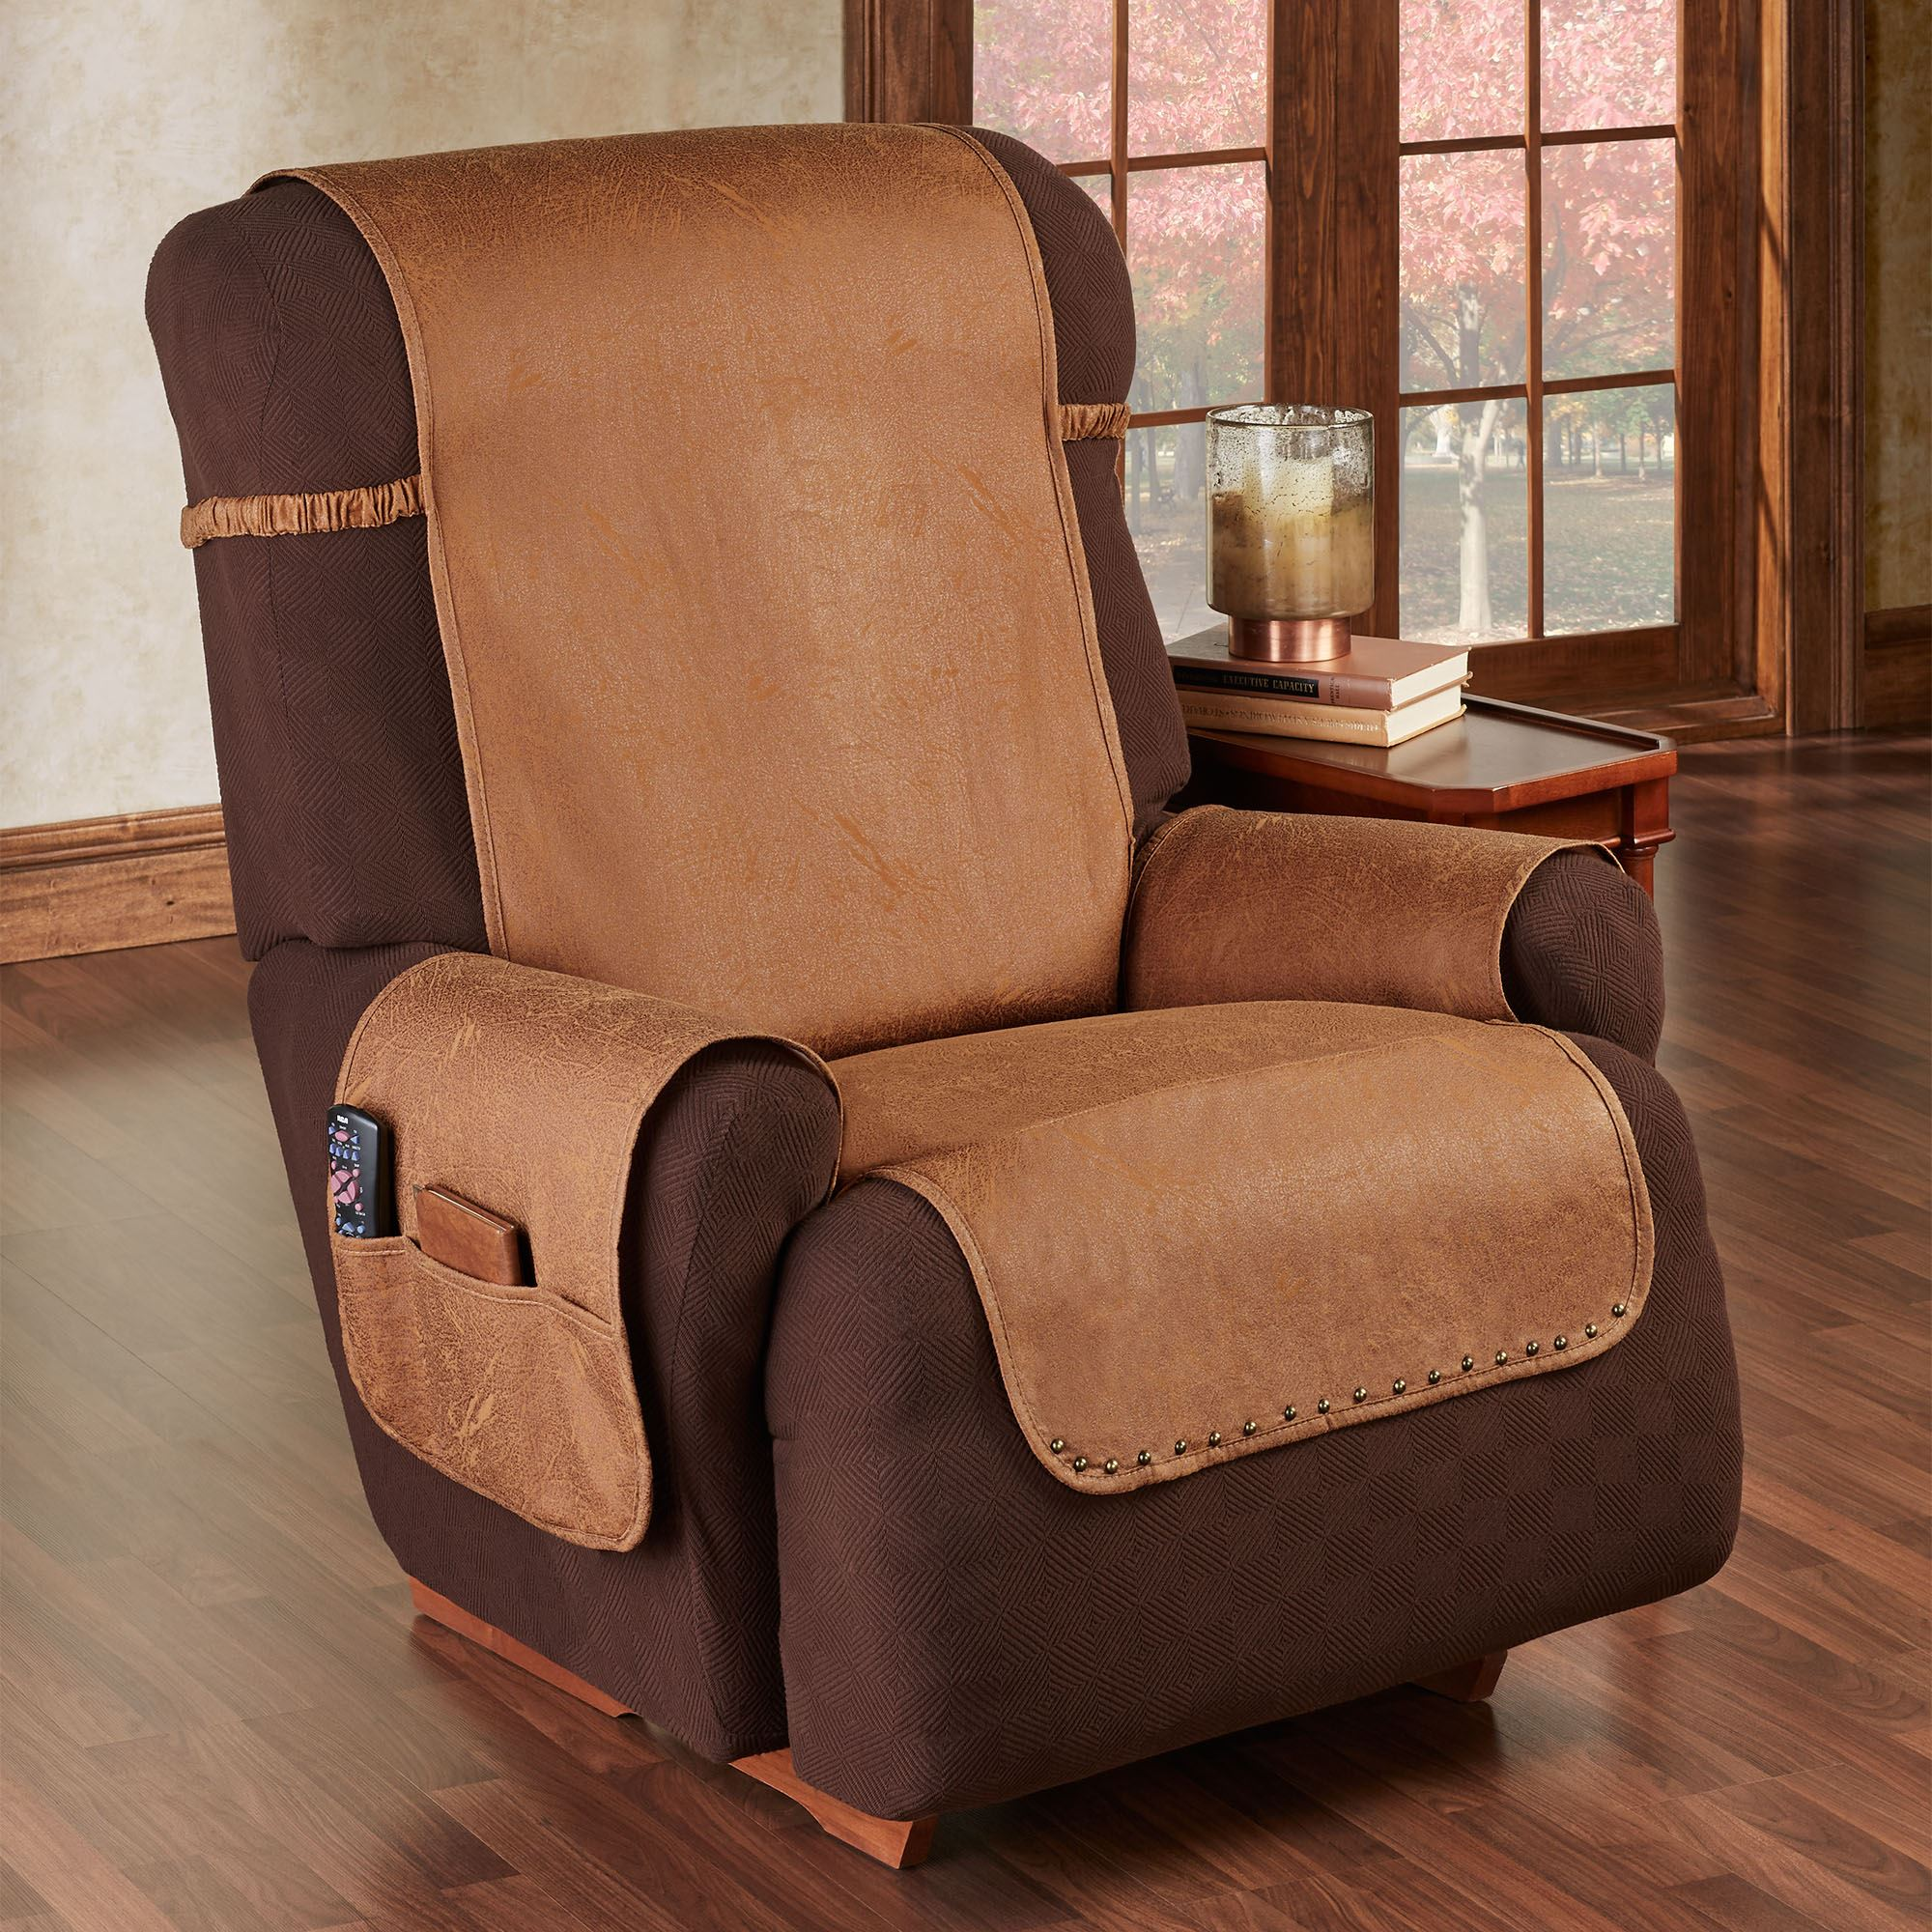 Stonehill Cognac Slip Resistant Recliner Furniture Protector